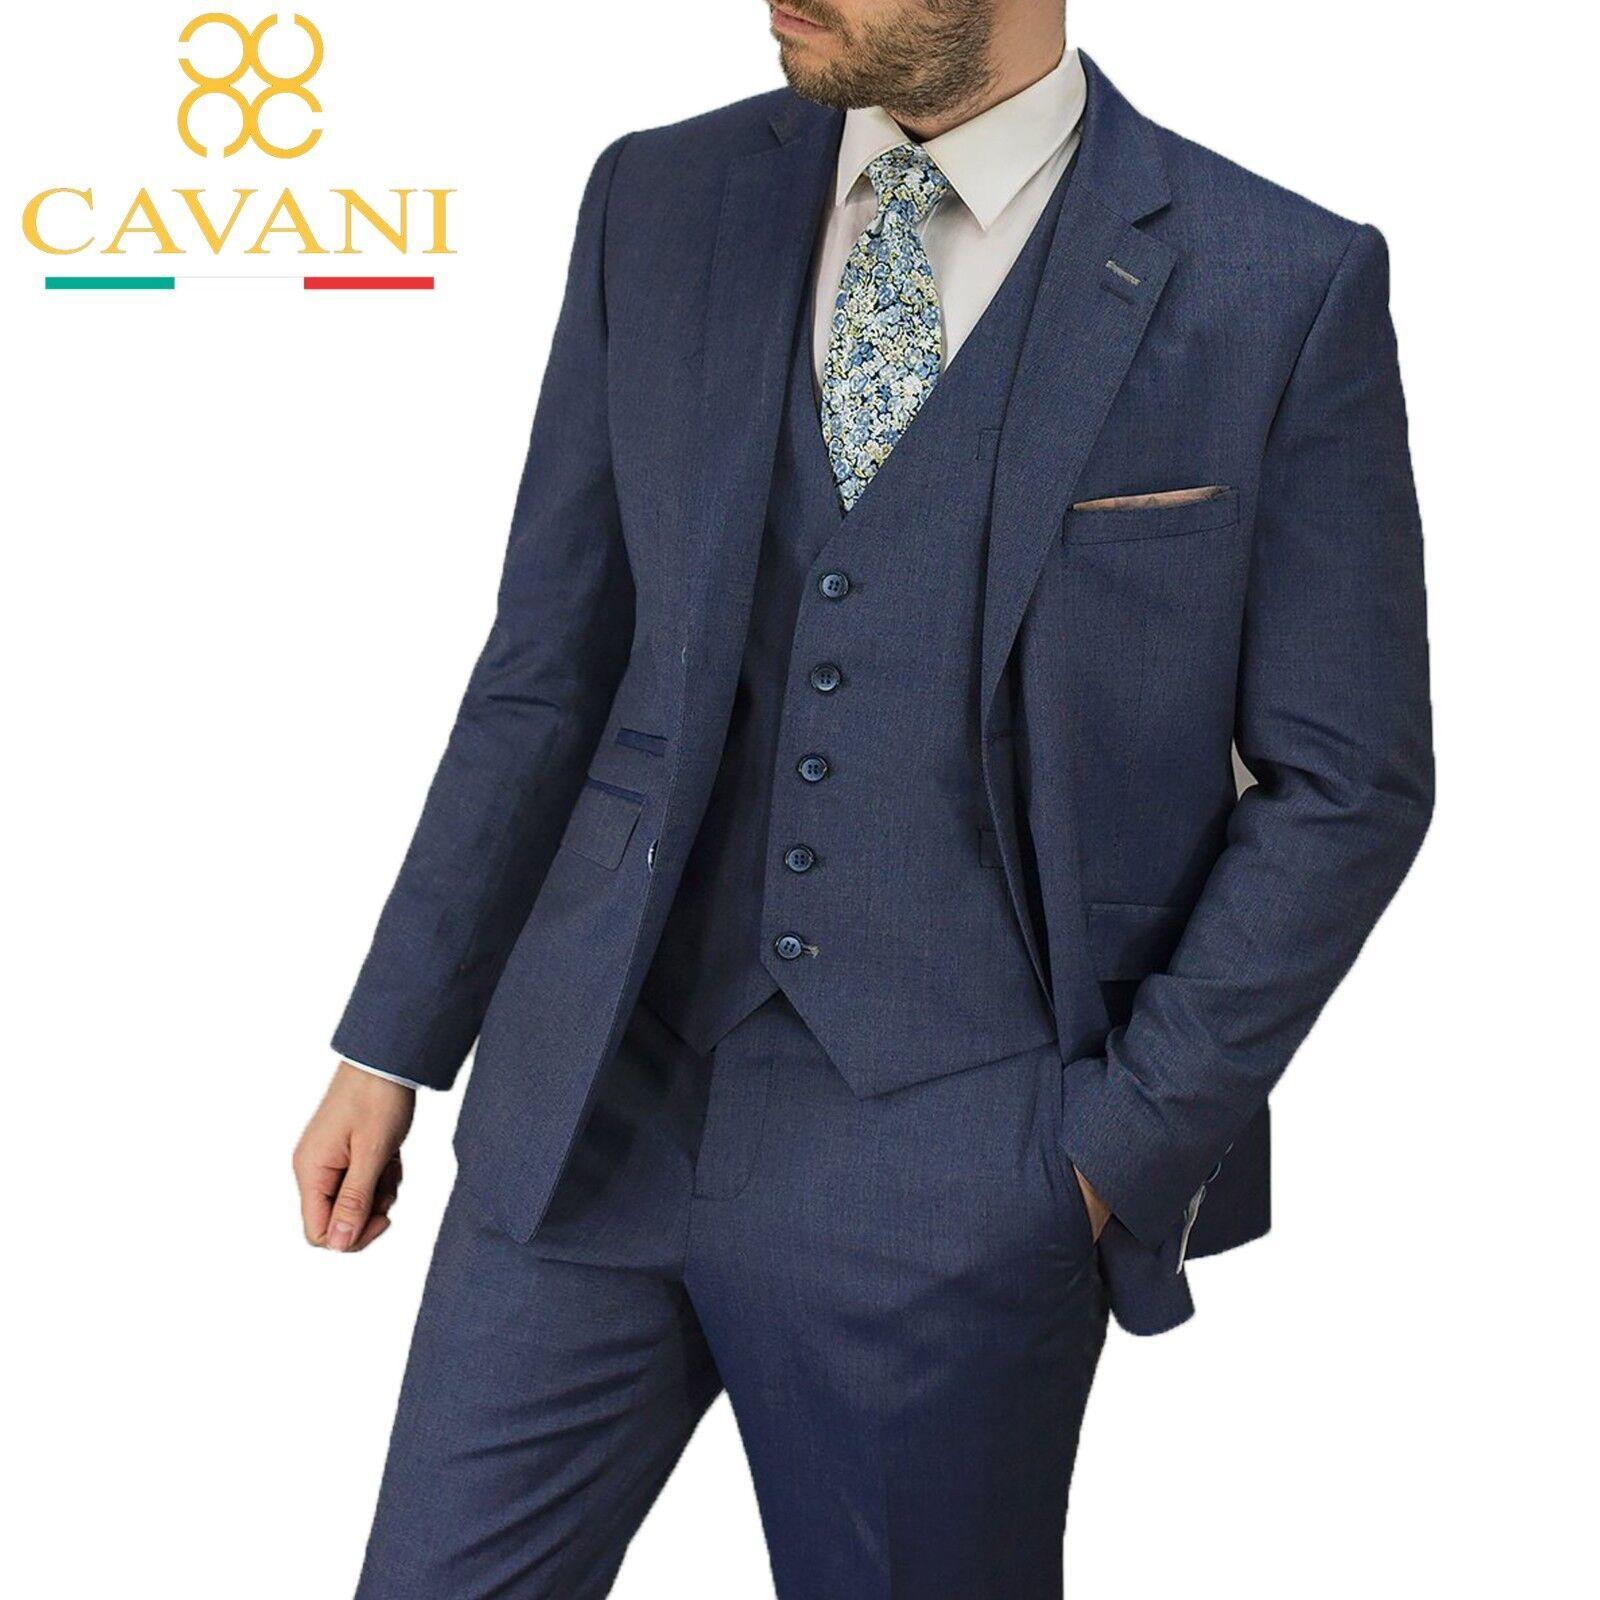 Herren Cavani Navy Blau Wedding Formal Lined Blazer 3 Piece Suit Sold Separately